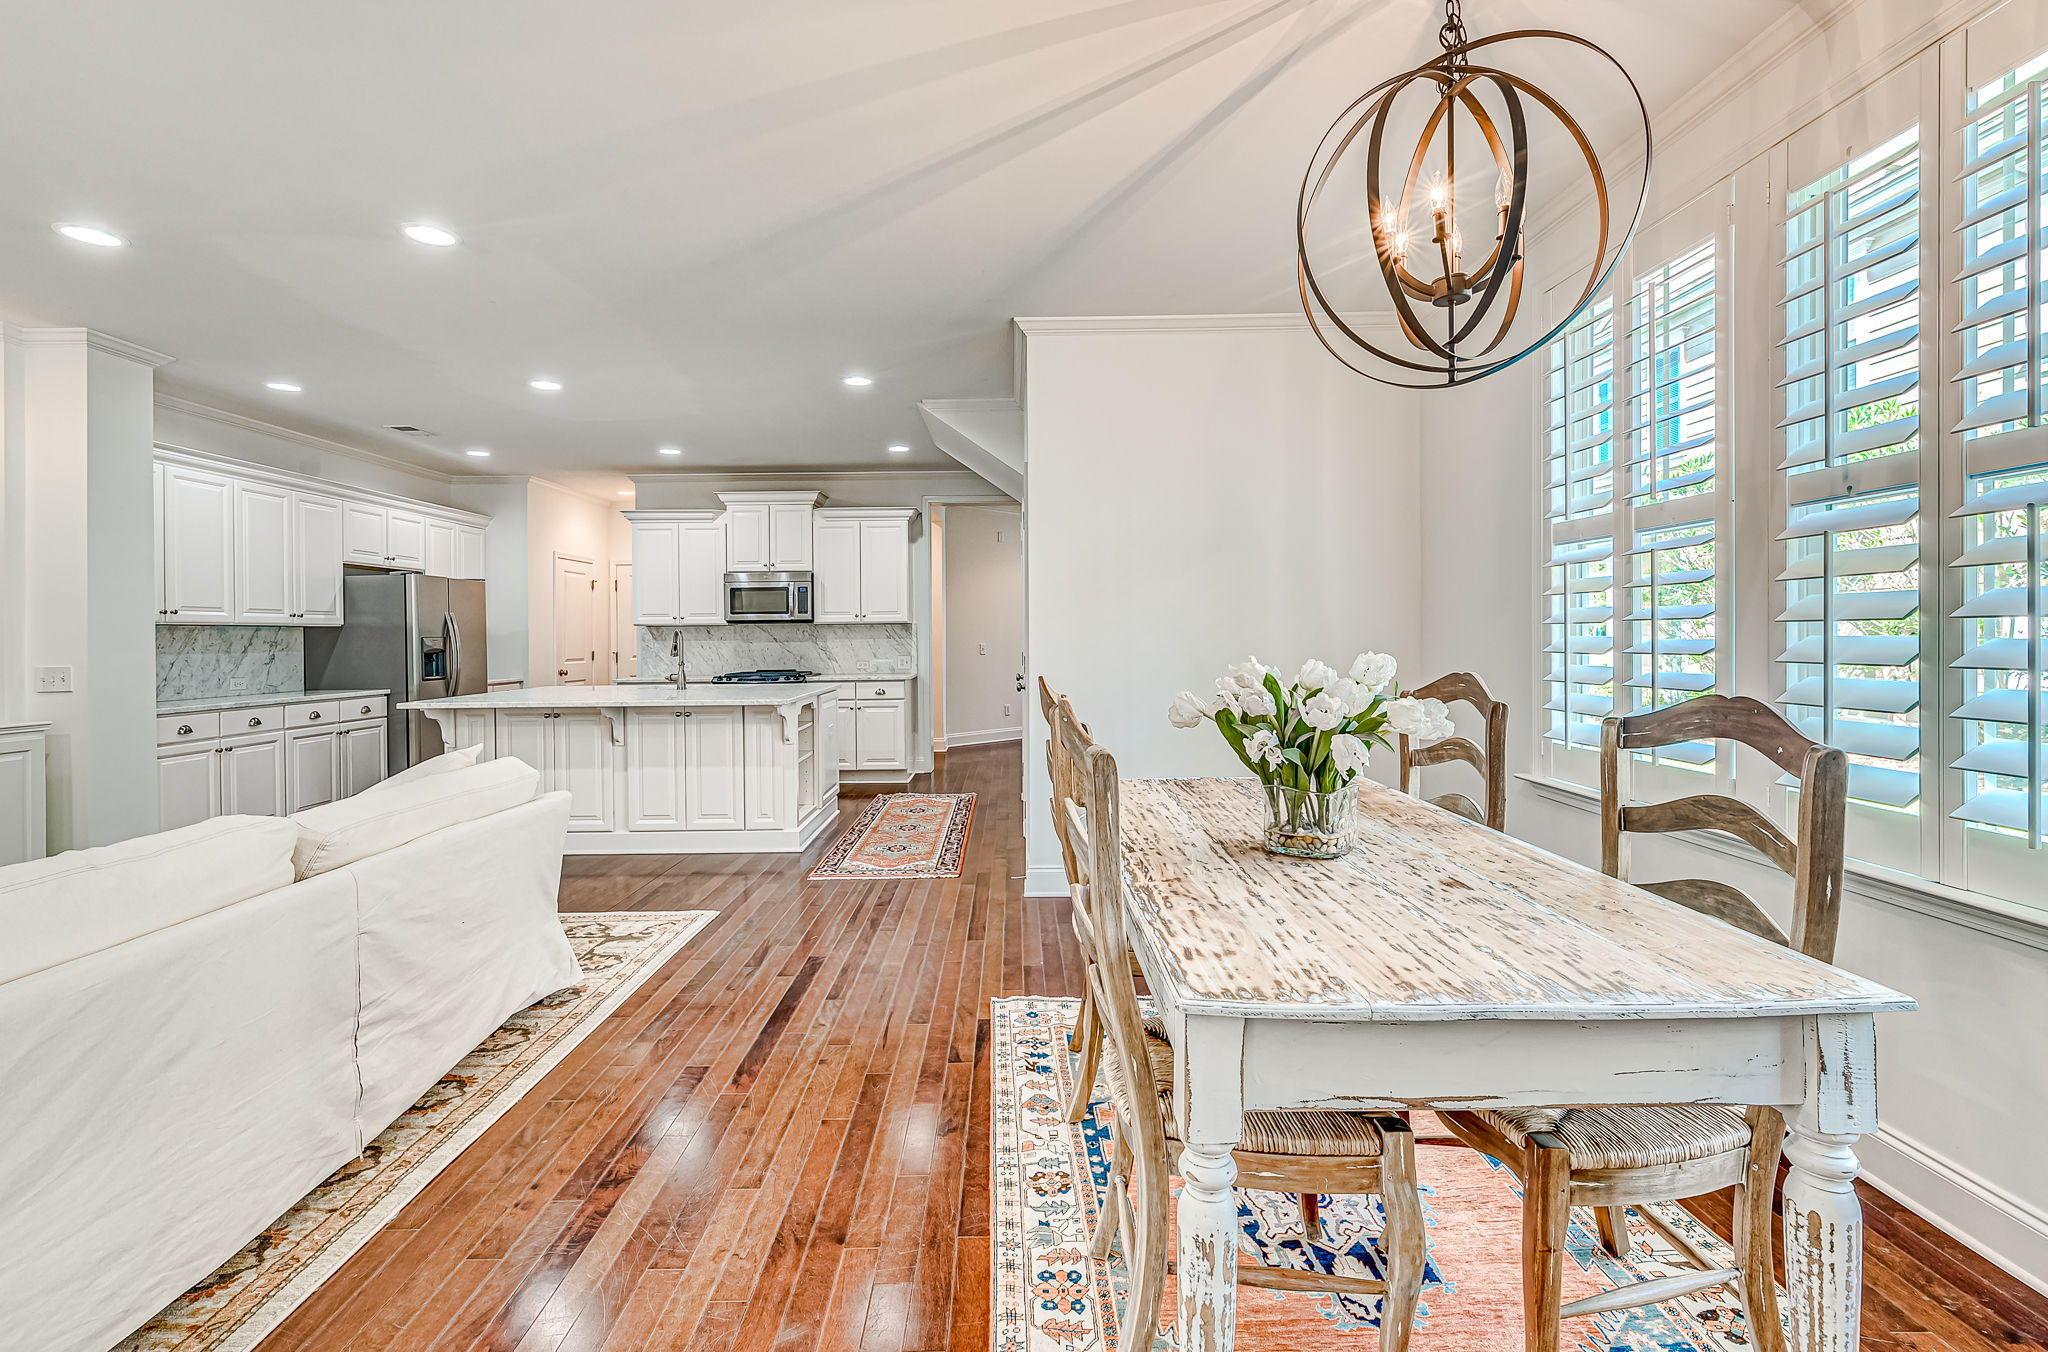 Dunes West Homes For Sale - 2476 Kings Gate, Mount Pleasant, SC - 44